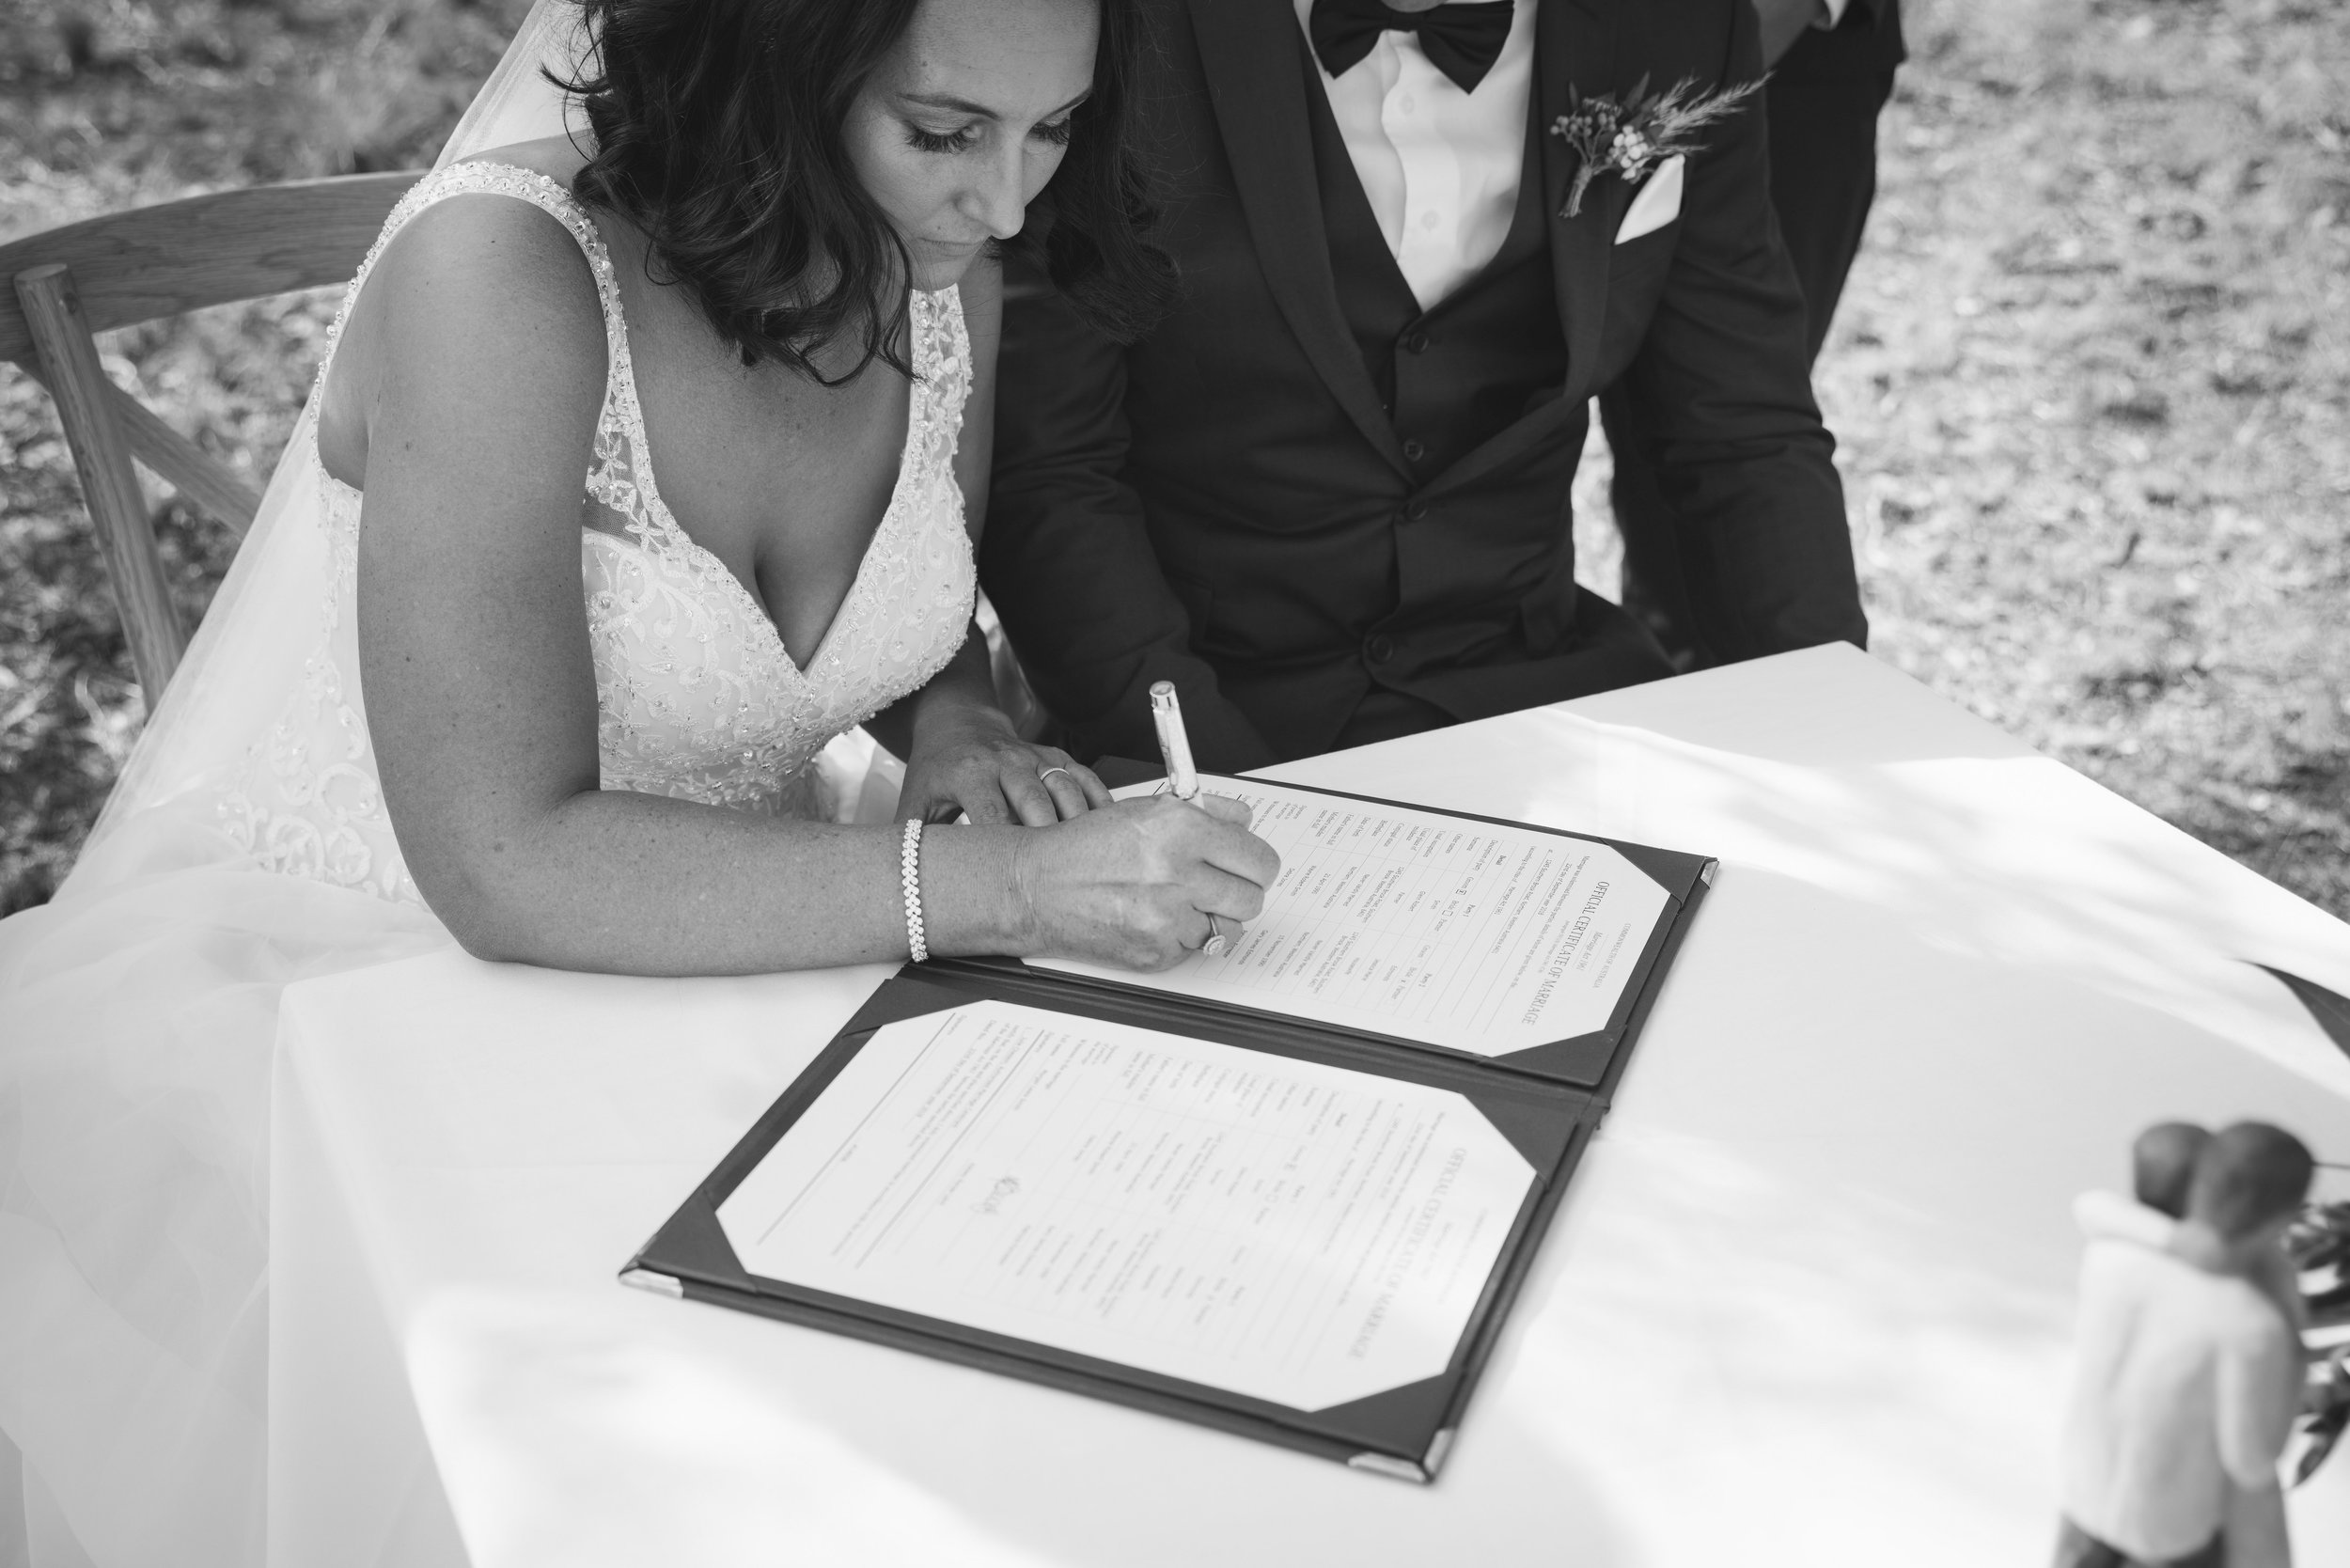 Angie Roe Photography Wheatbelt Avon Valley Farm Wedding (24).jpg